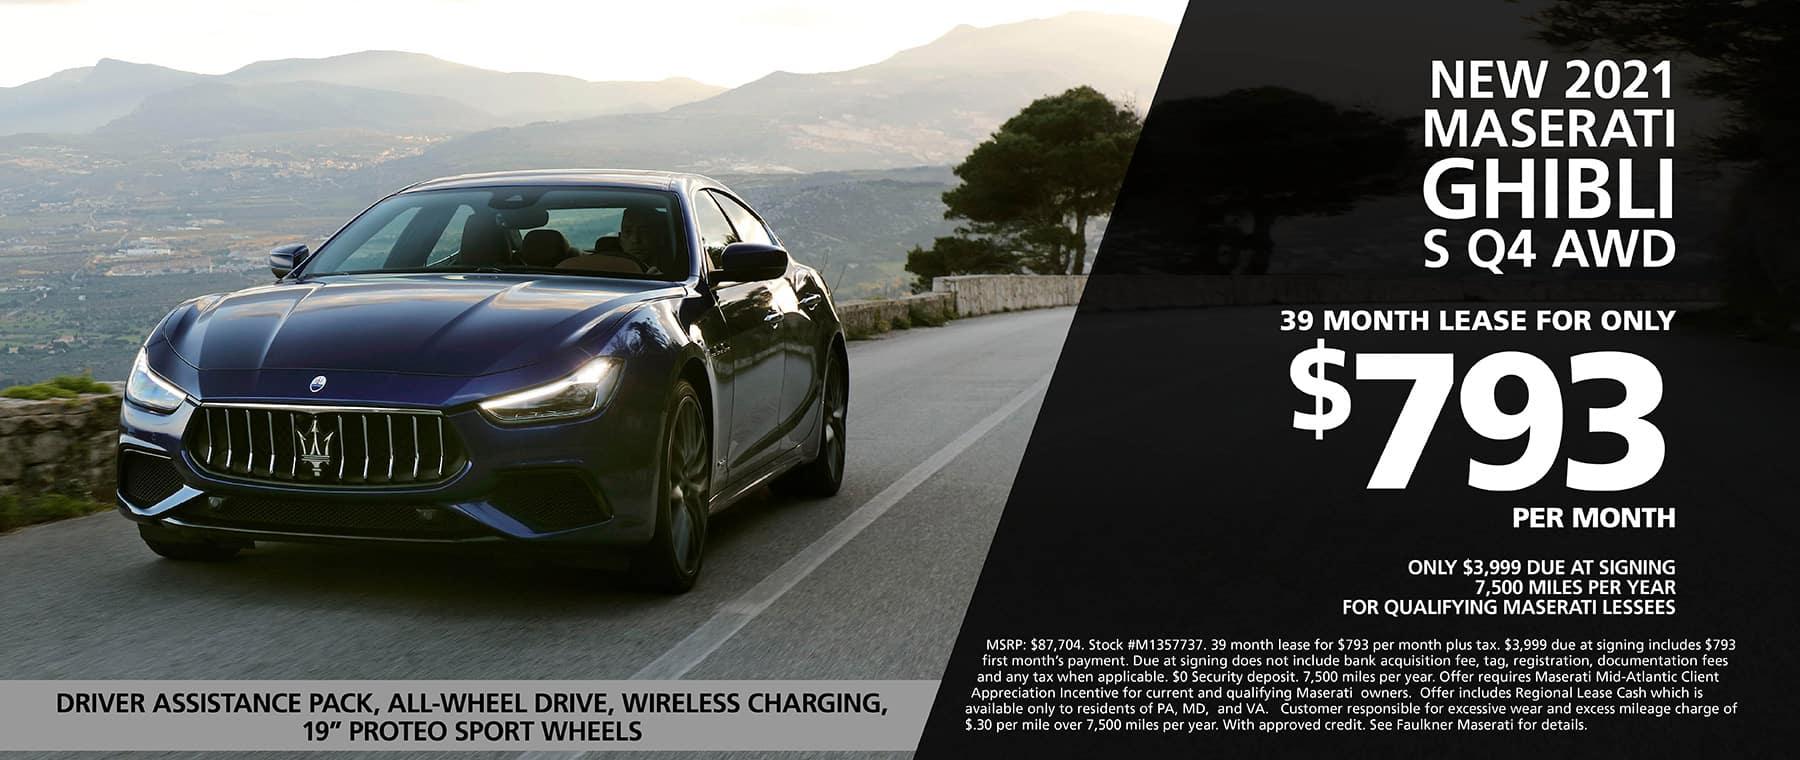 New 2021 Maserati Ghibli